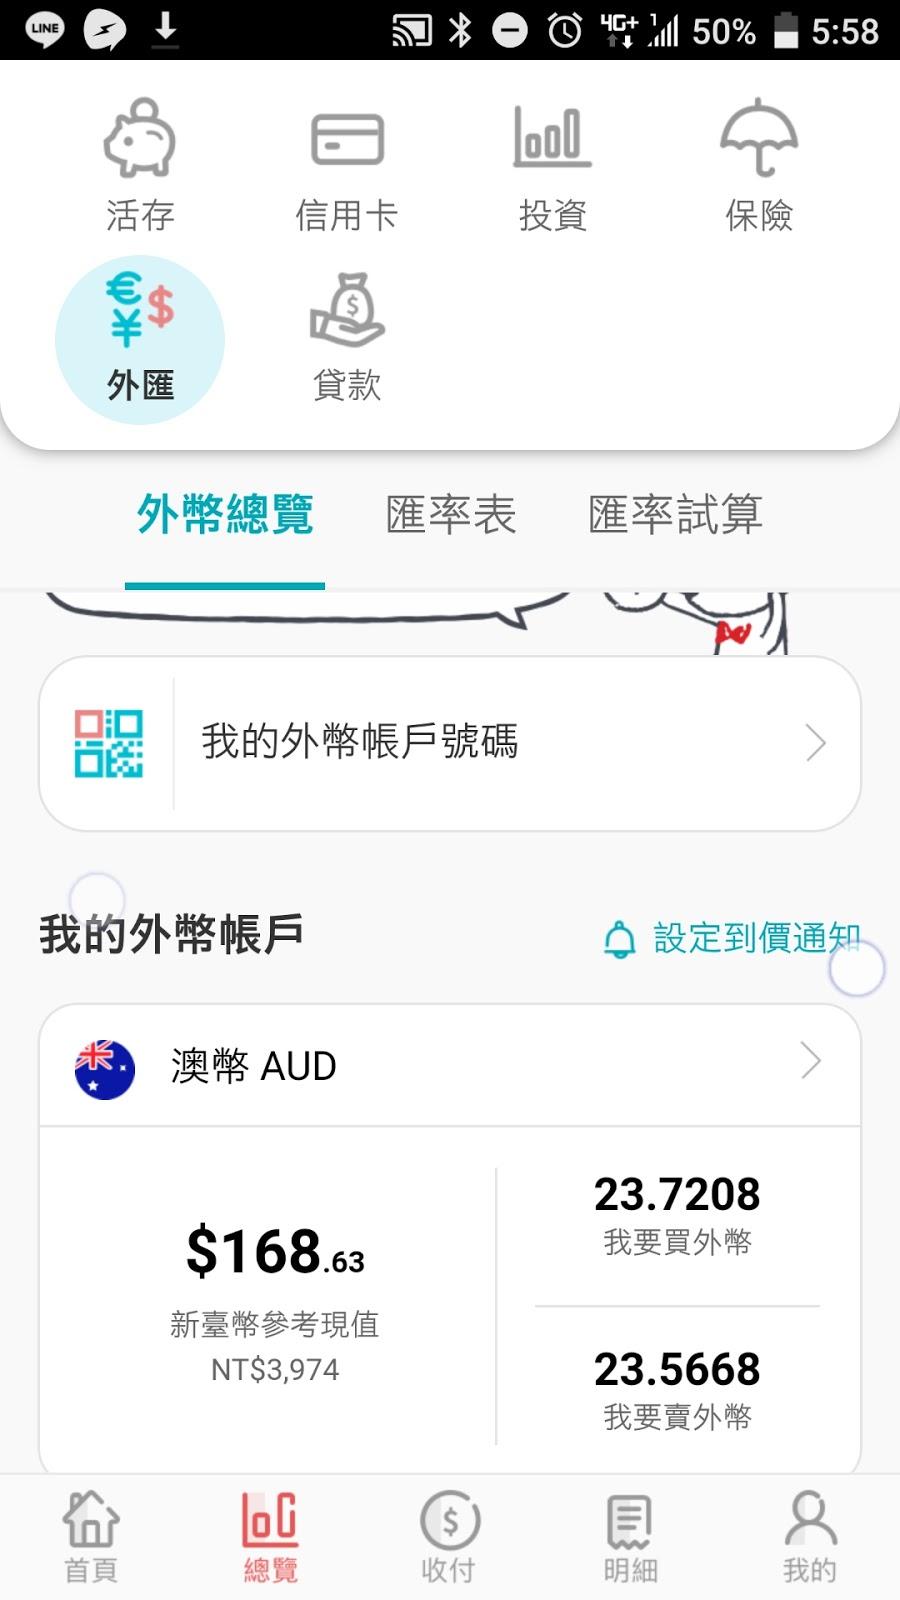 【3C科技 App】(懶人包)「臺新Richart』全臺首家外幣數位帳戶上線啦!(2018/1/26送出申請&1/30更新+四步驟實際 ...